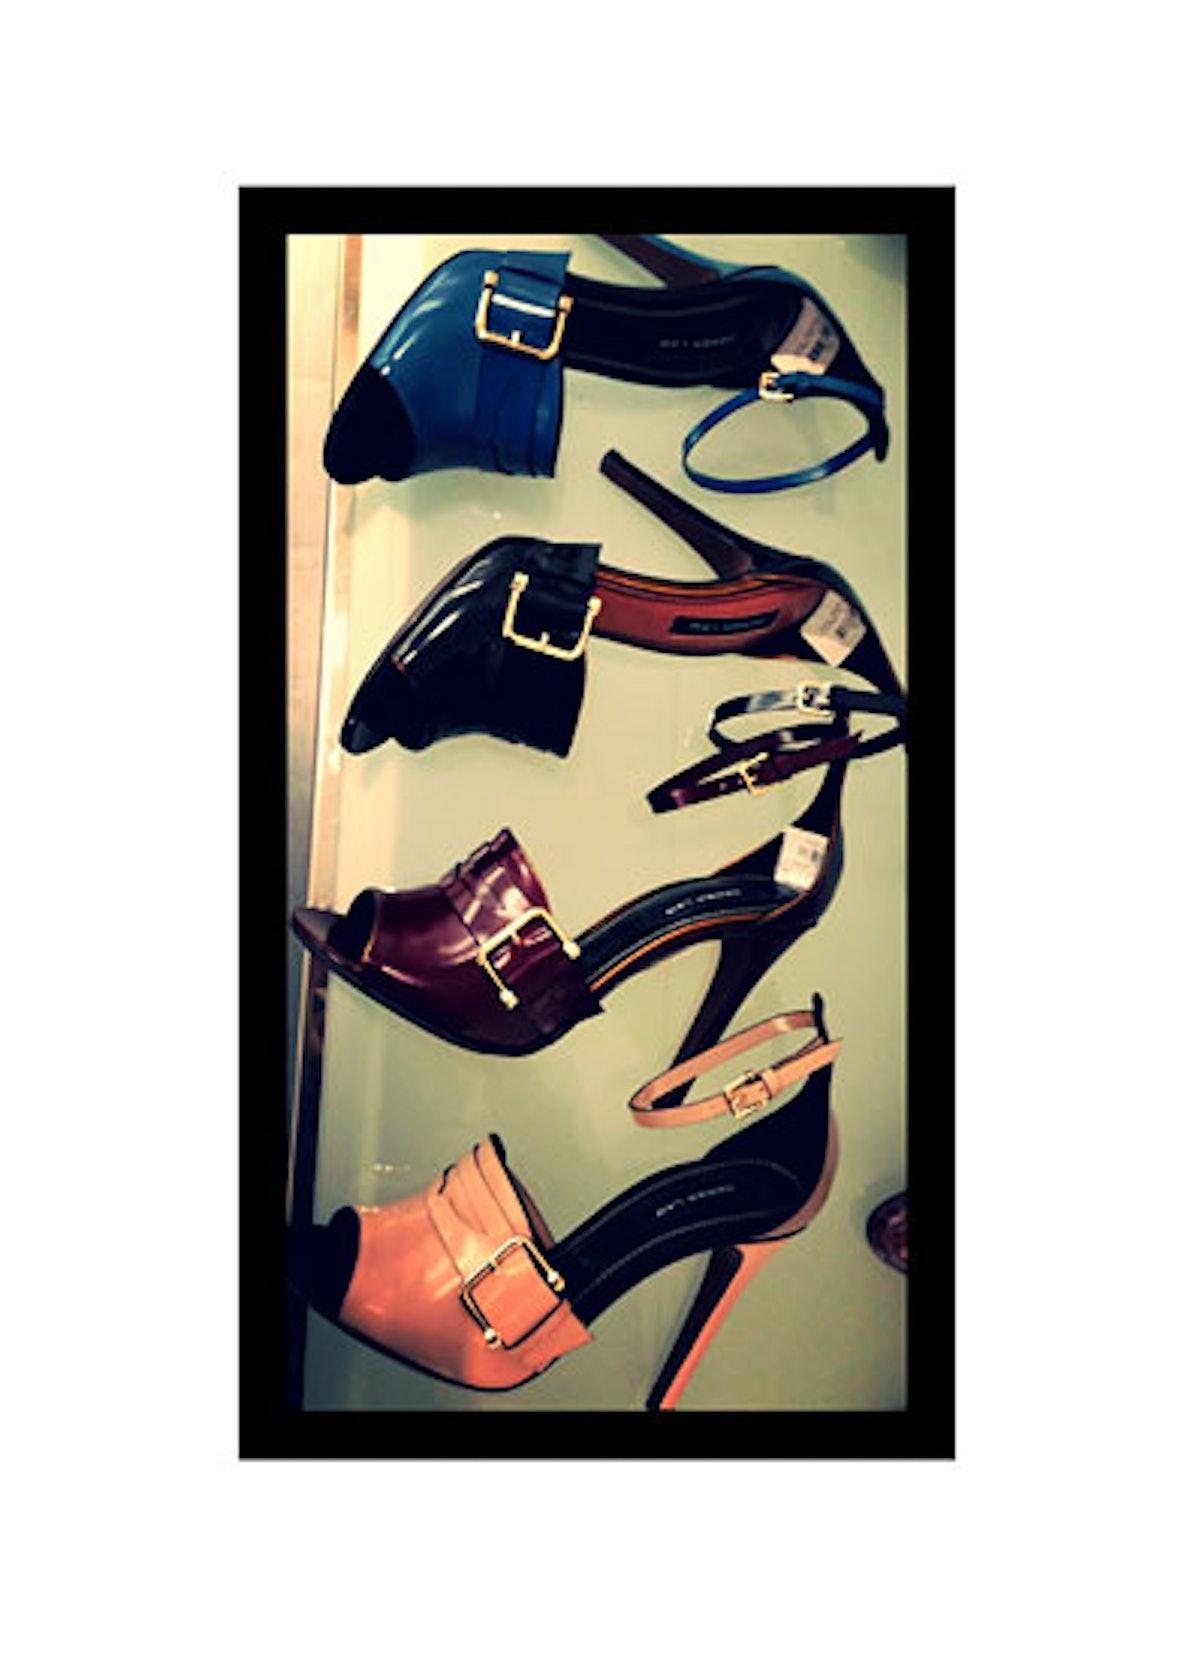 acss-best-shoes-fall-2013-04-v.jpg